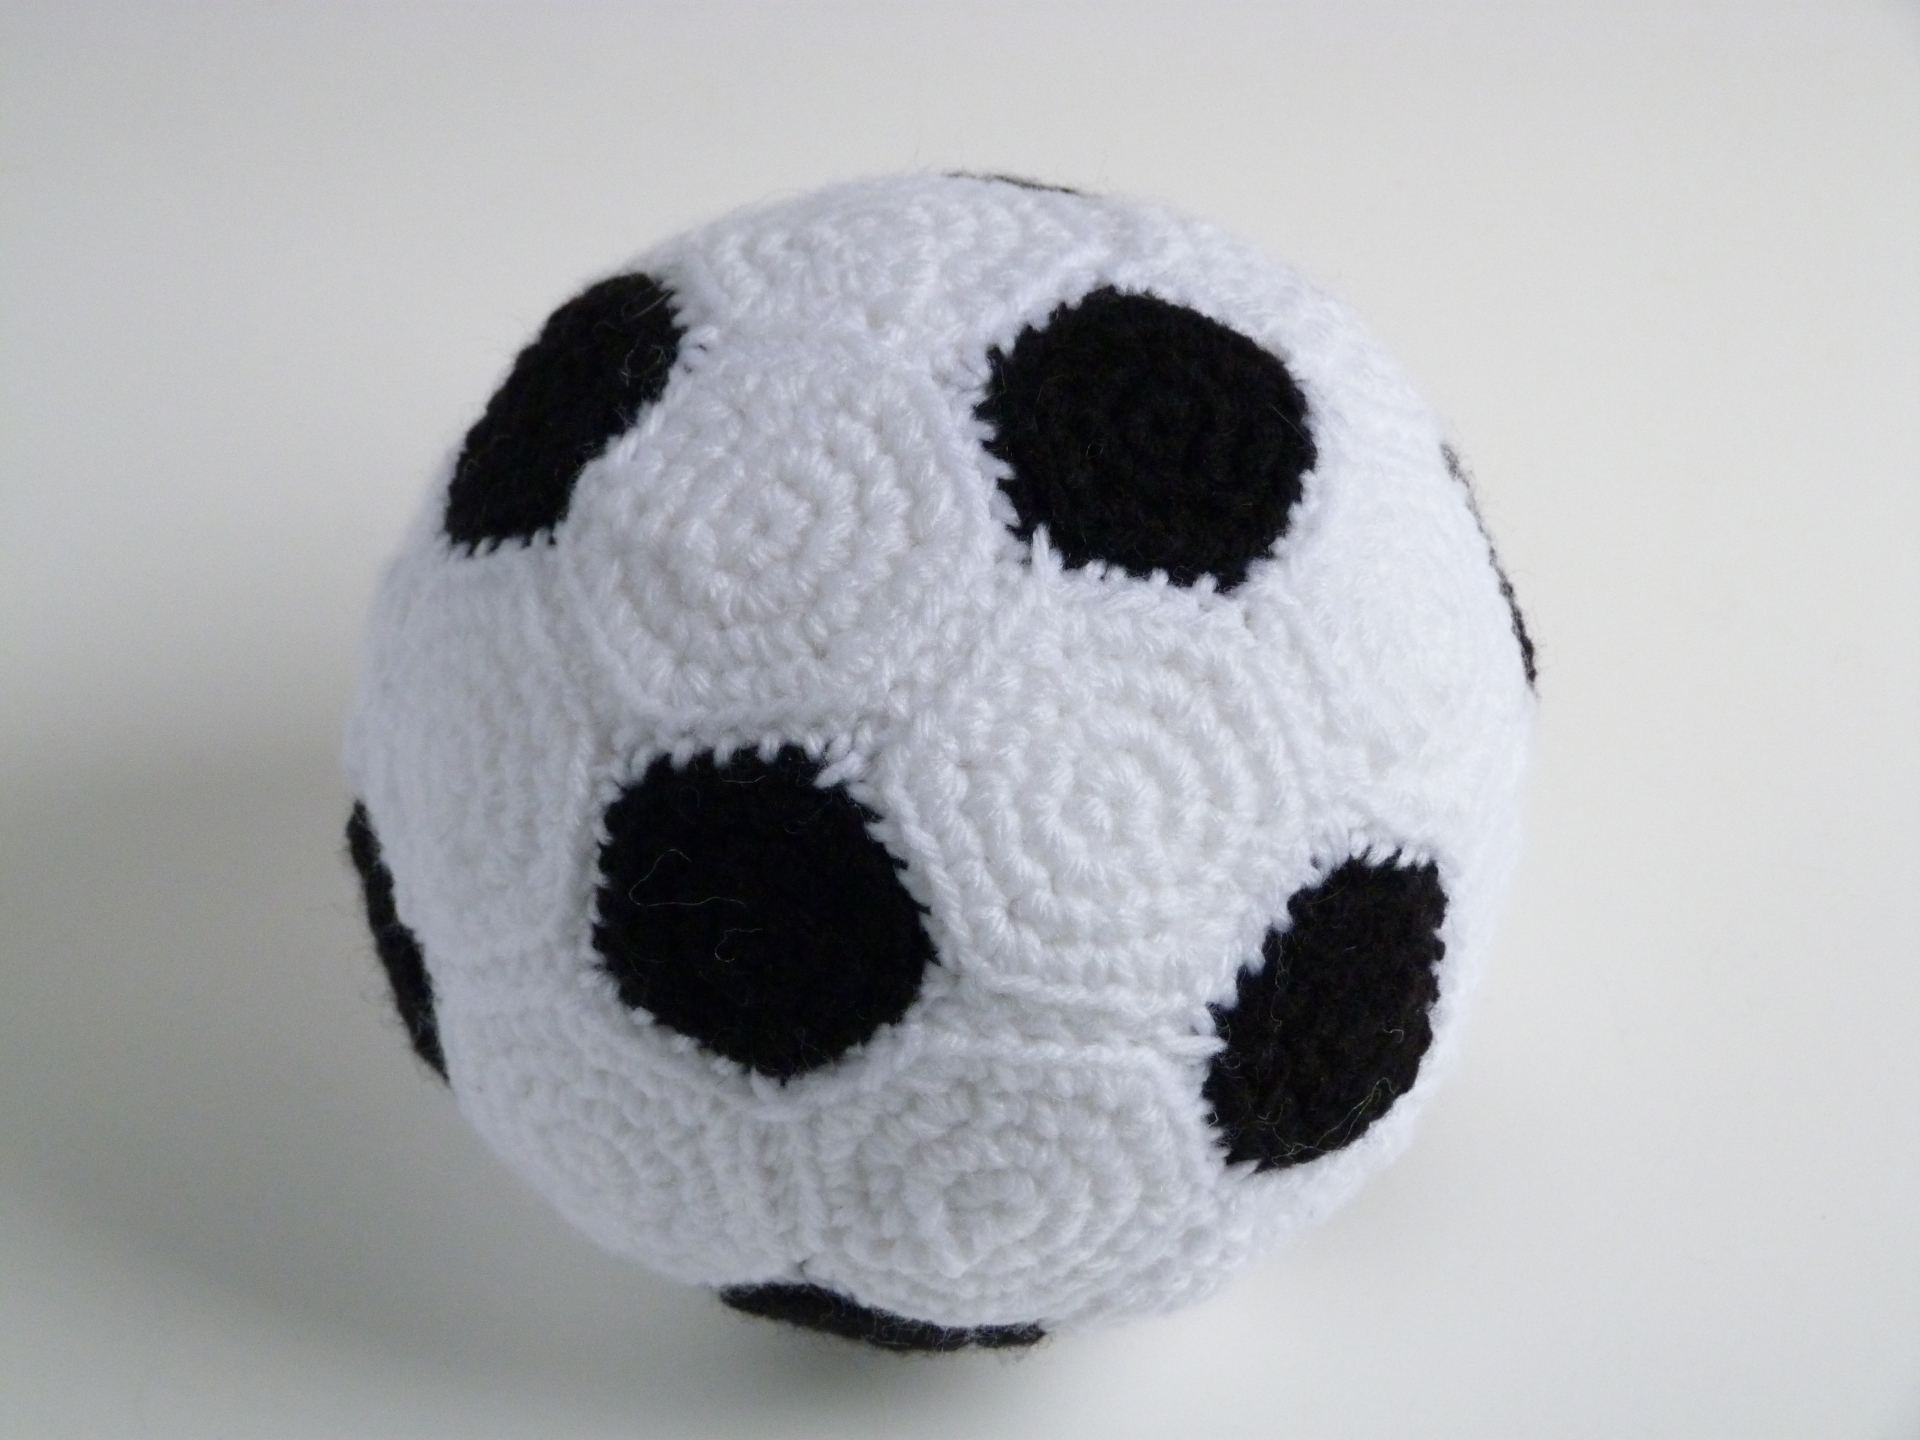 3. Soccer Ball Plushie